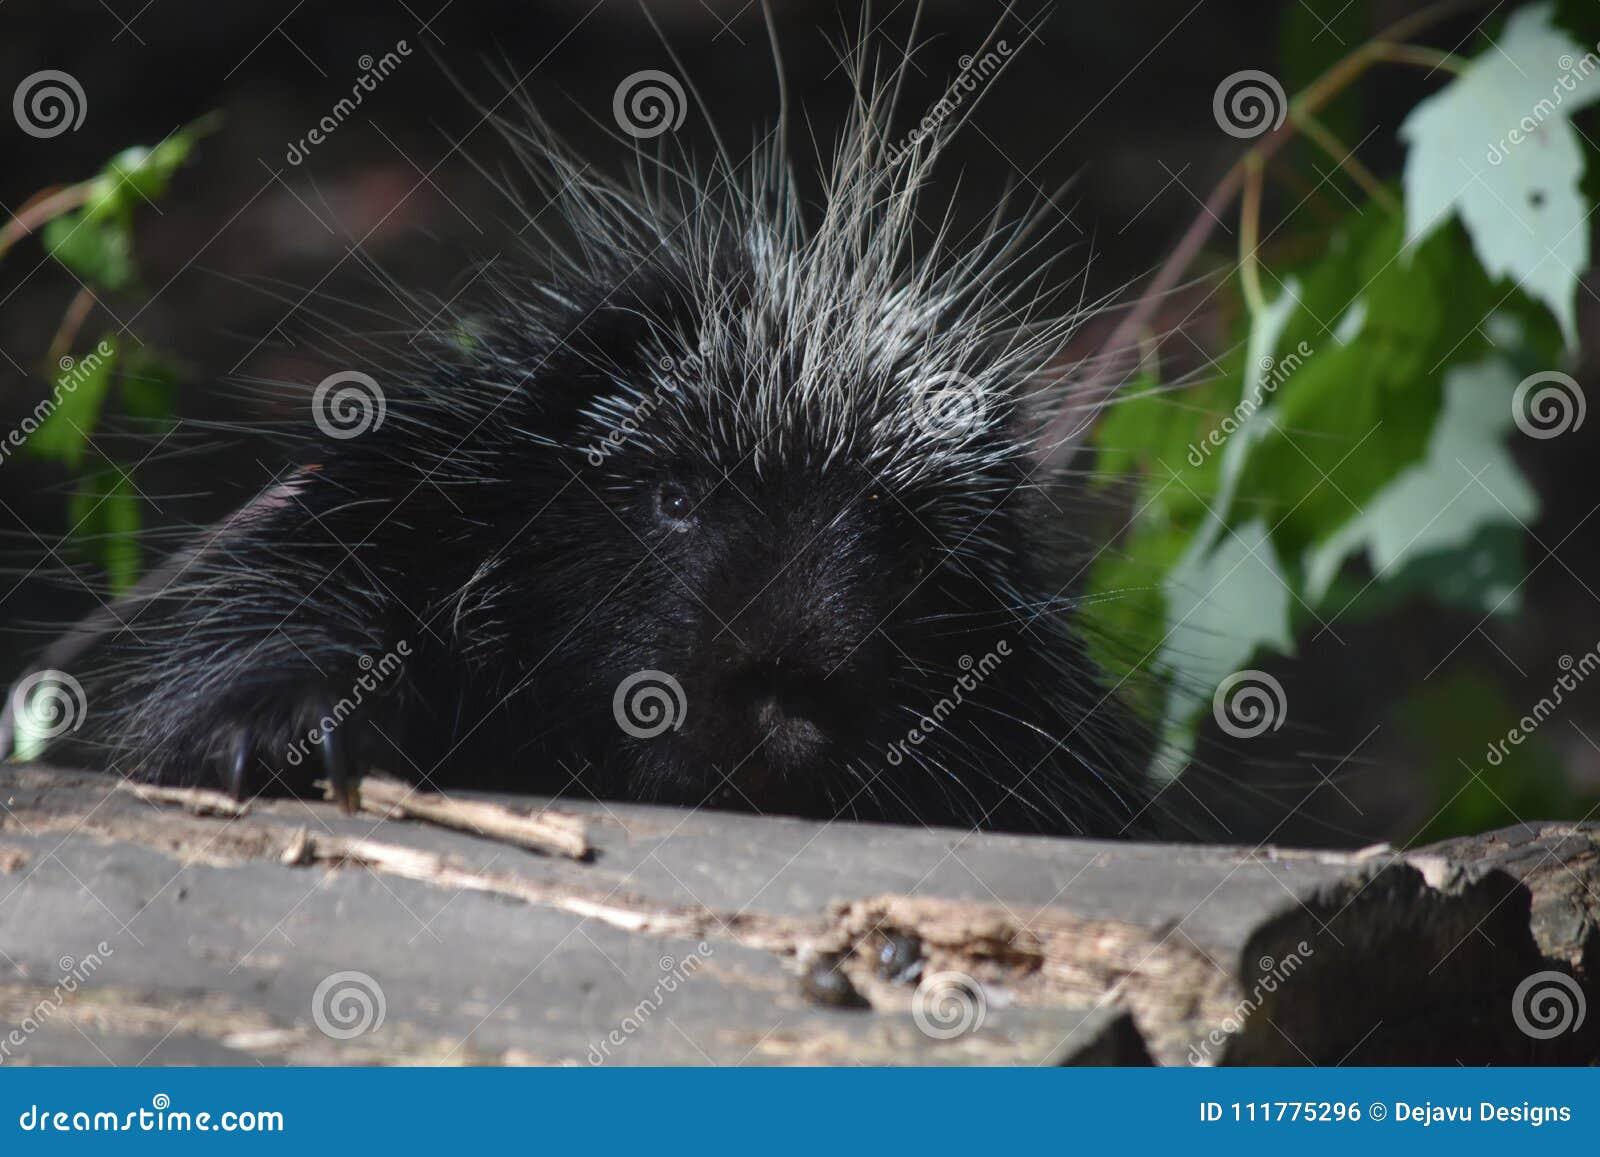 Pretty black porcupine climbing over a large log